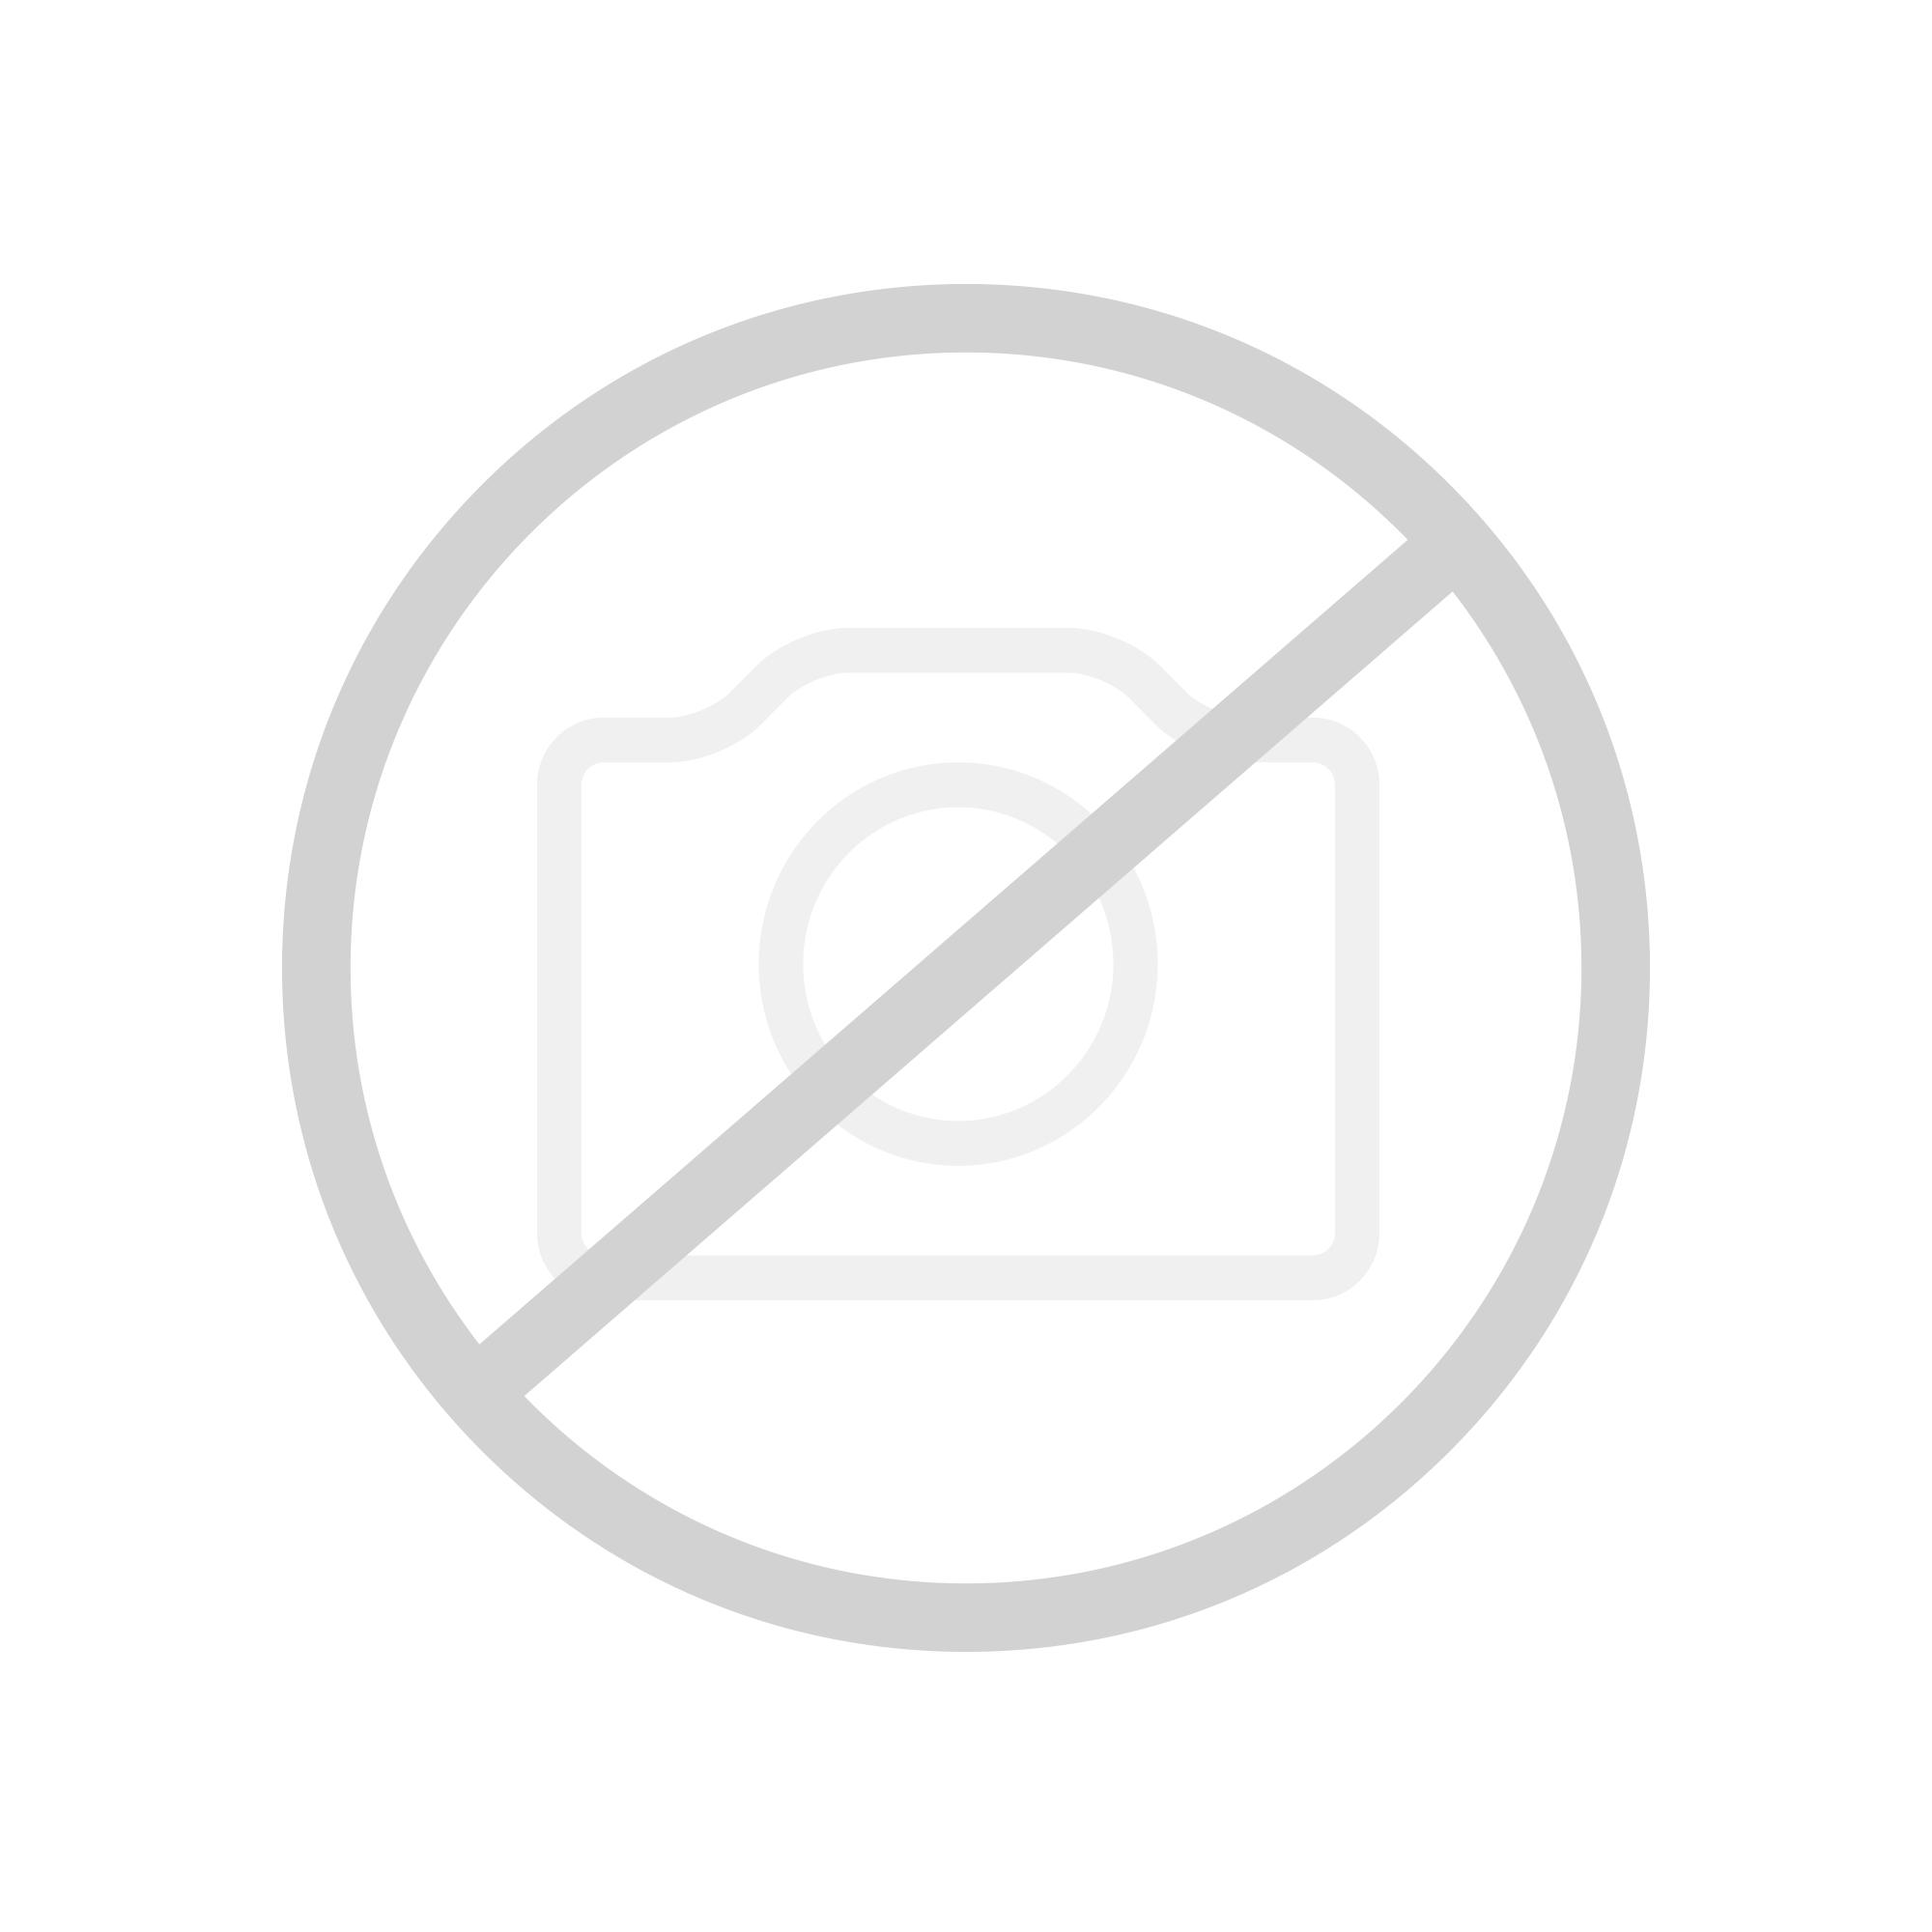 unterputzmodule f r sanit rr ume reuter onlineshop. Black Bedroom Furniture Sets. Home Design Ideas